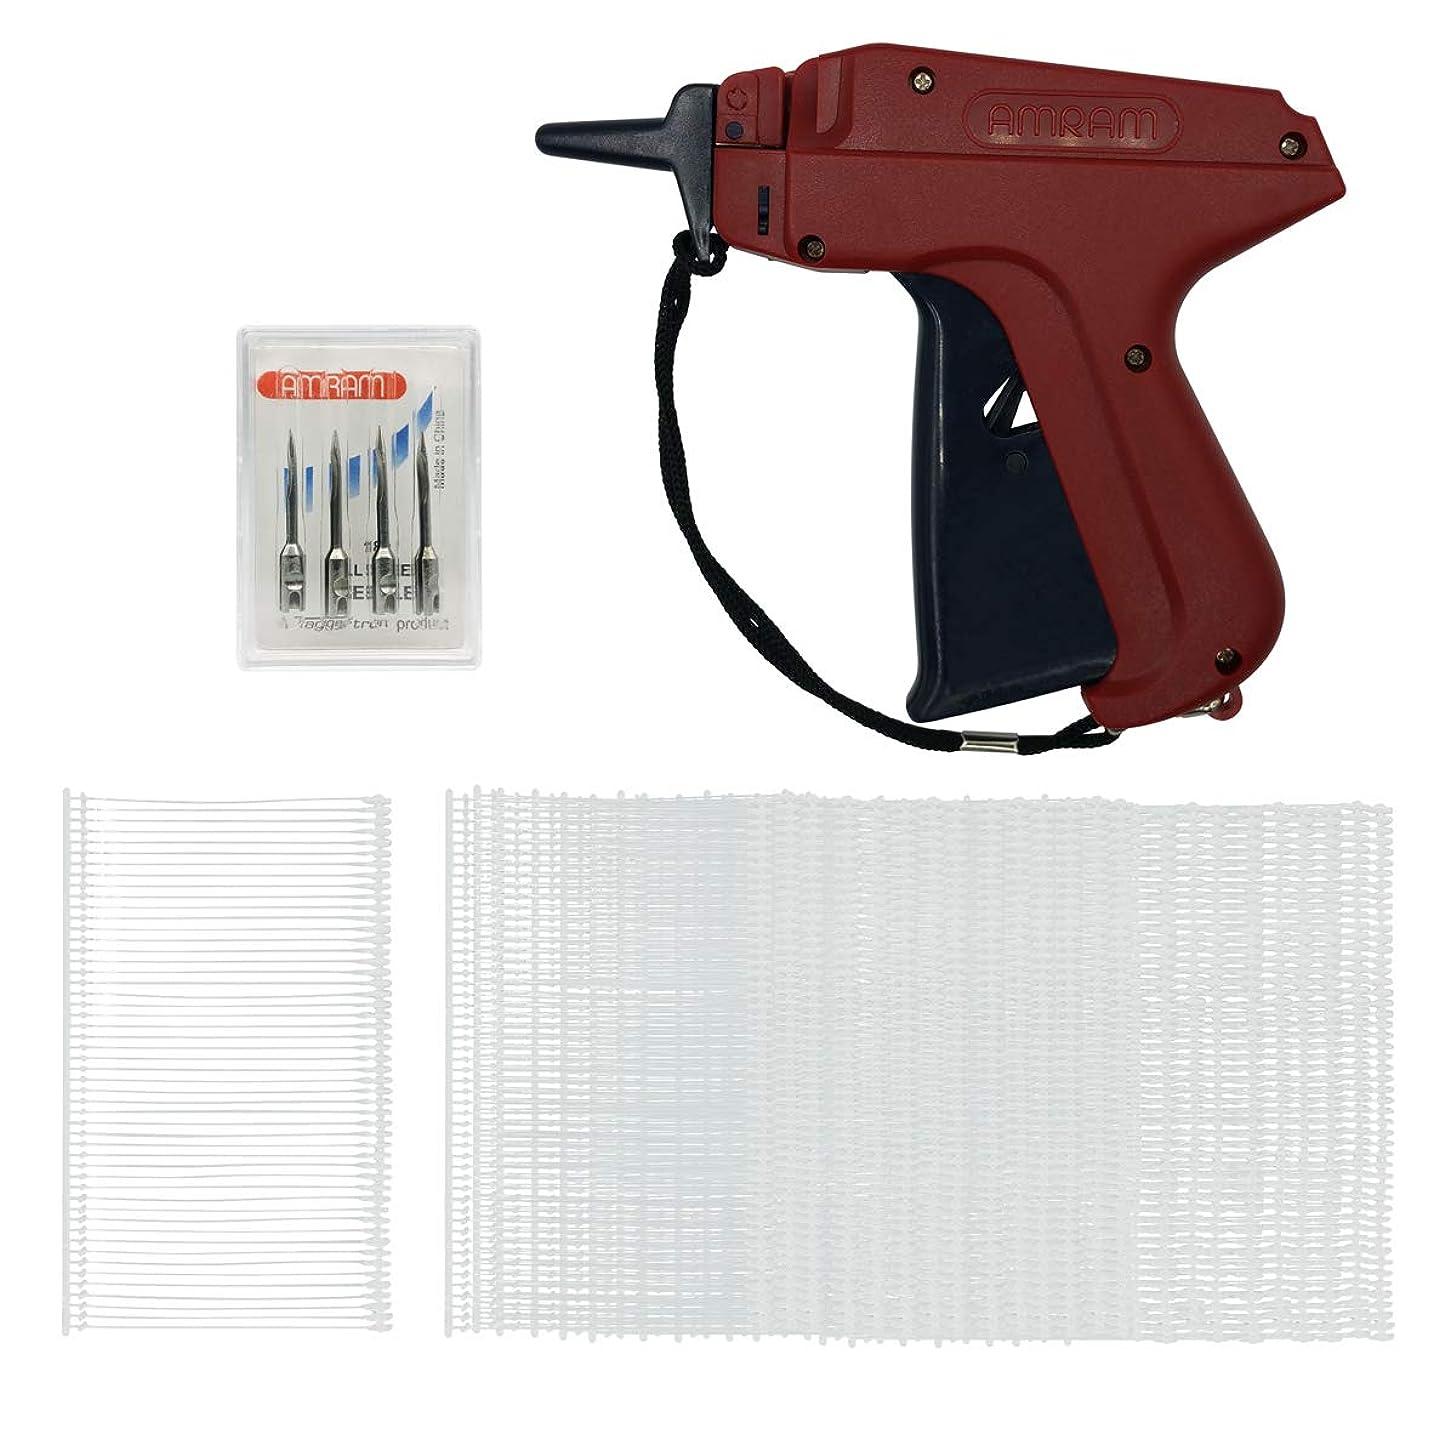 Amram Tagger Standard Tag Attaching Tagging Gun Bonus KIT with 5 Needles and 1250 2